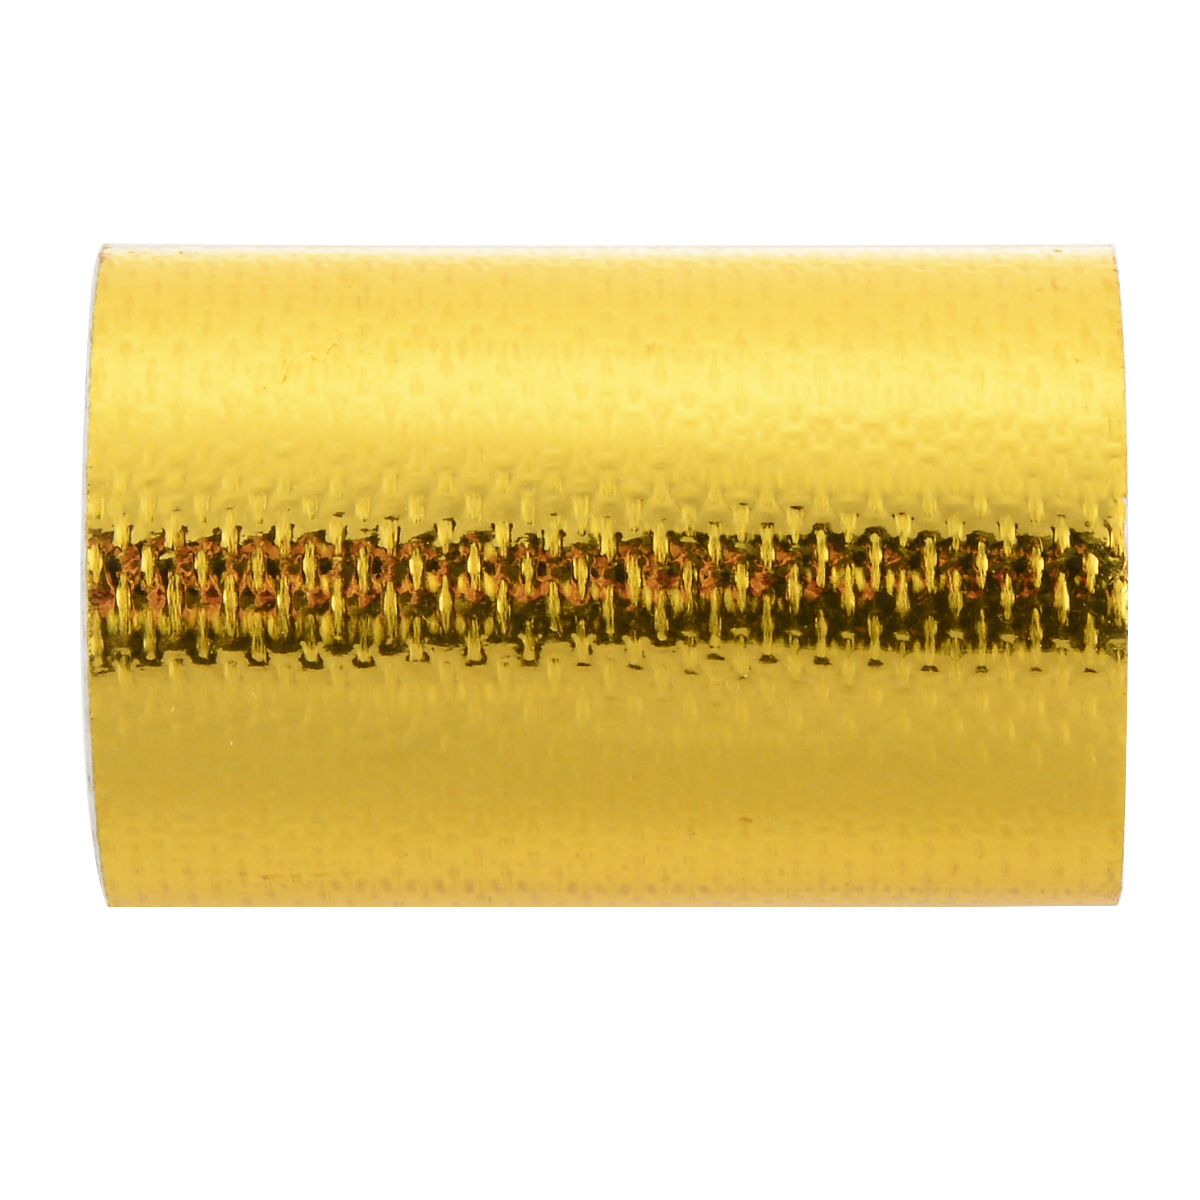 Durable 1Roll 5cm x 80cm Fiberglass Adhesive Reflective Gold High Temperature Heat Shield Wrap Tape Waterproof